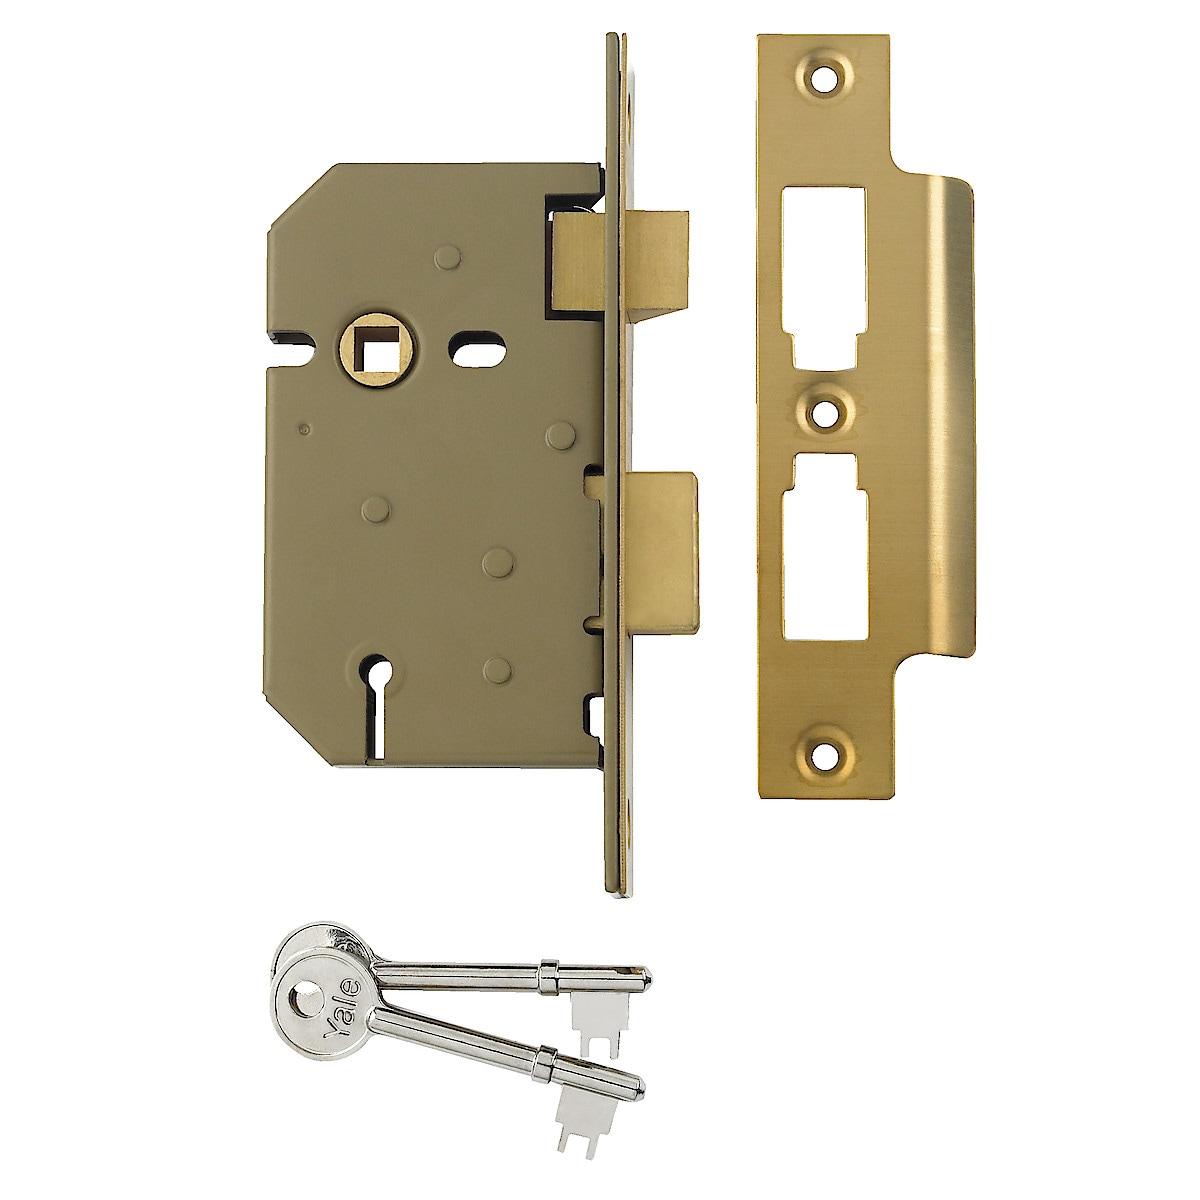 PM320 3-Lever Brass Sashlock